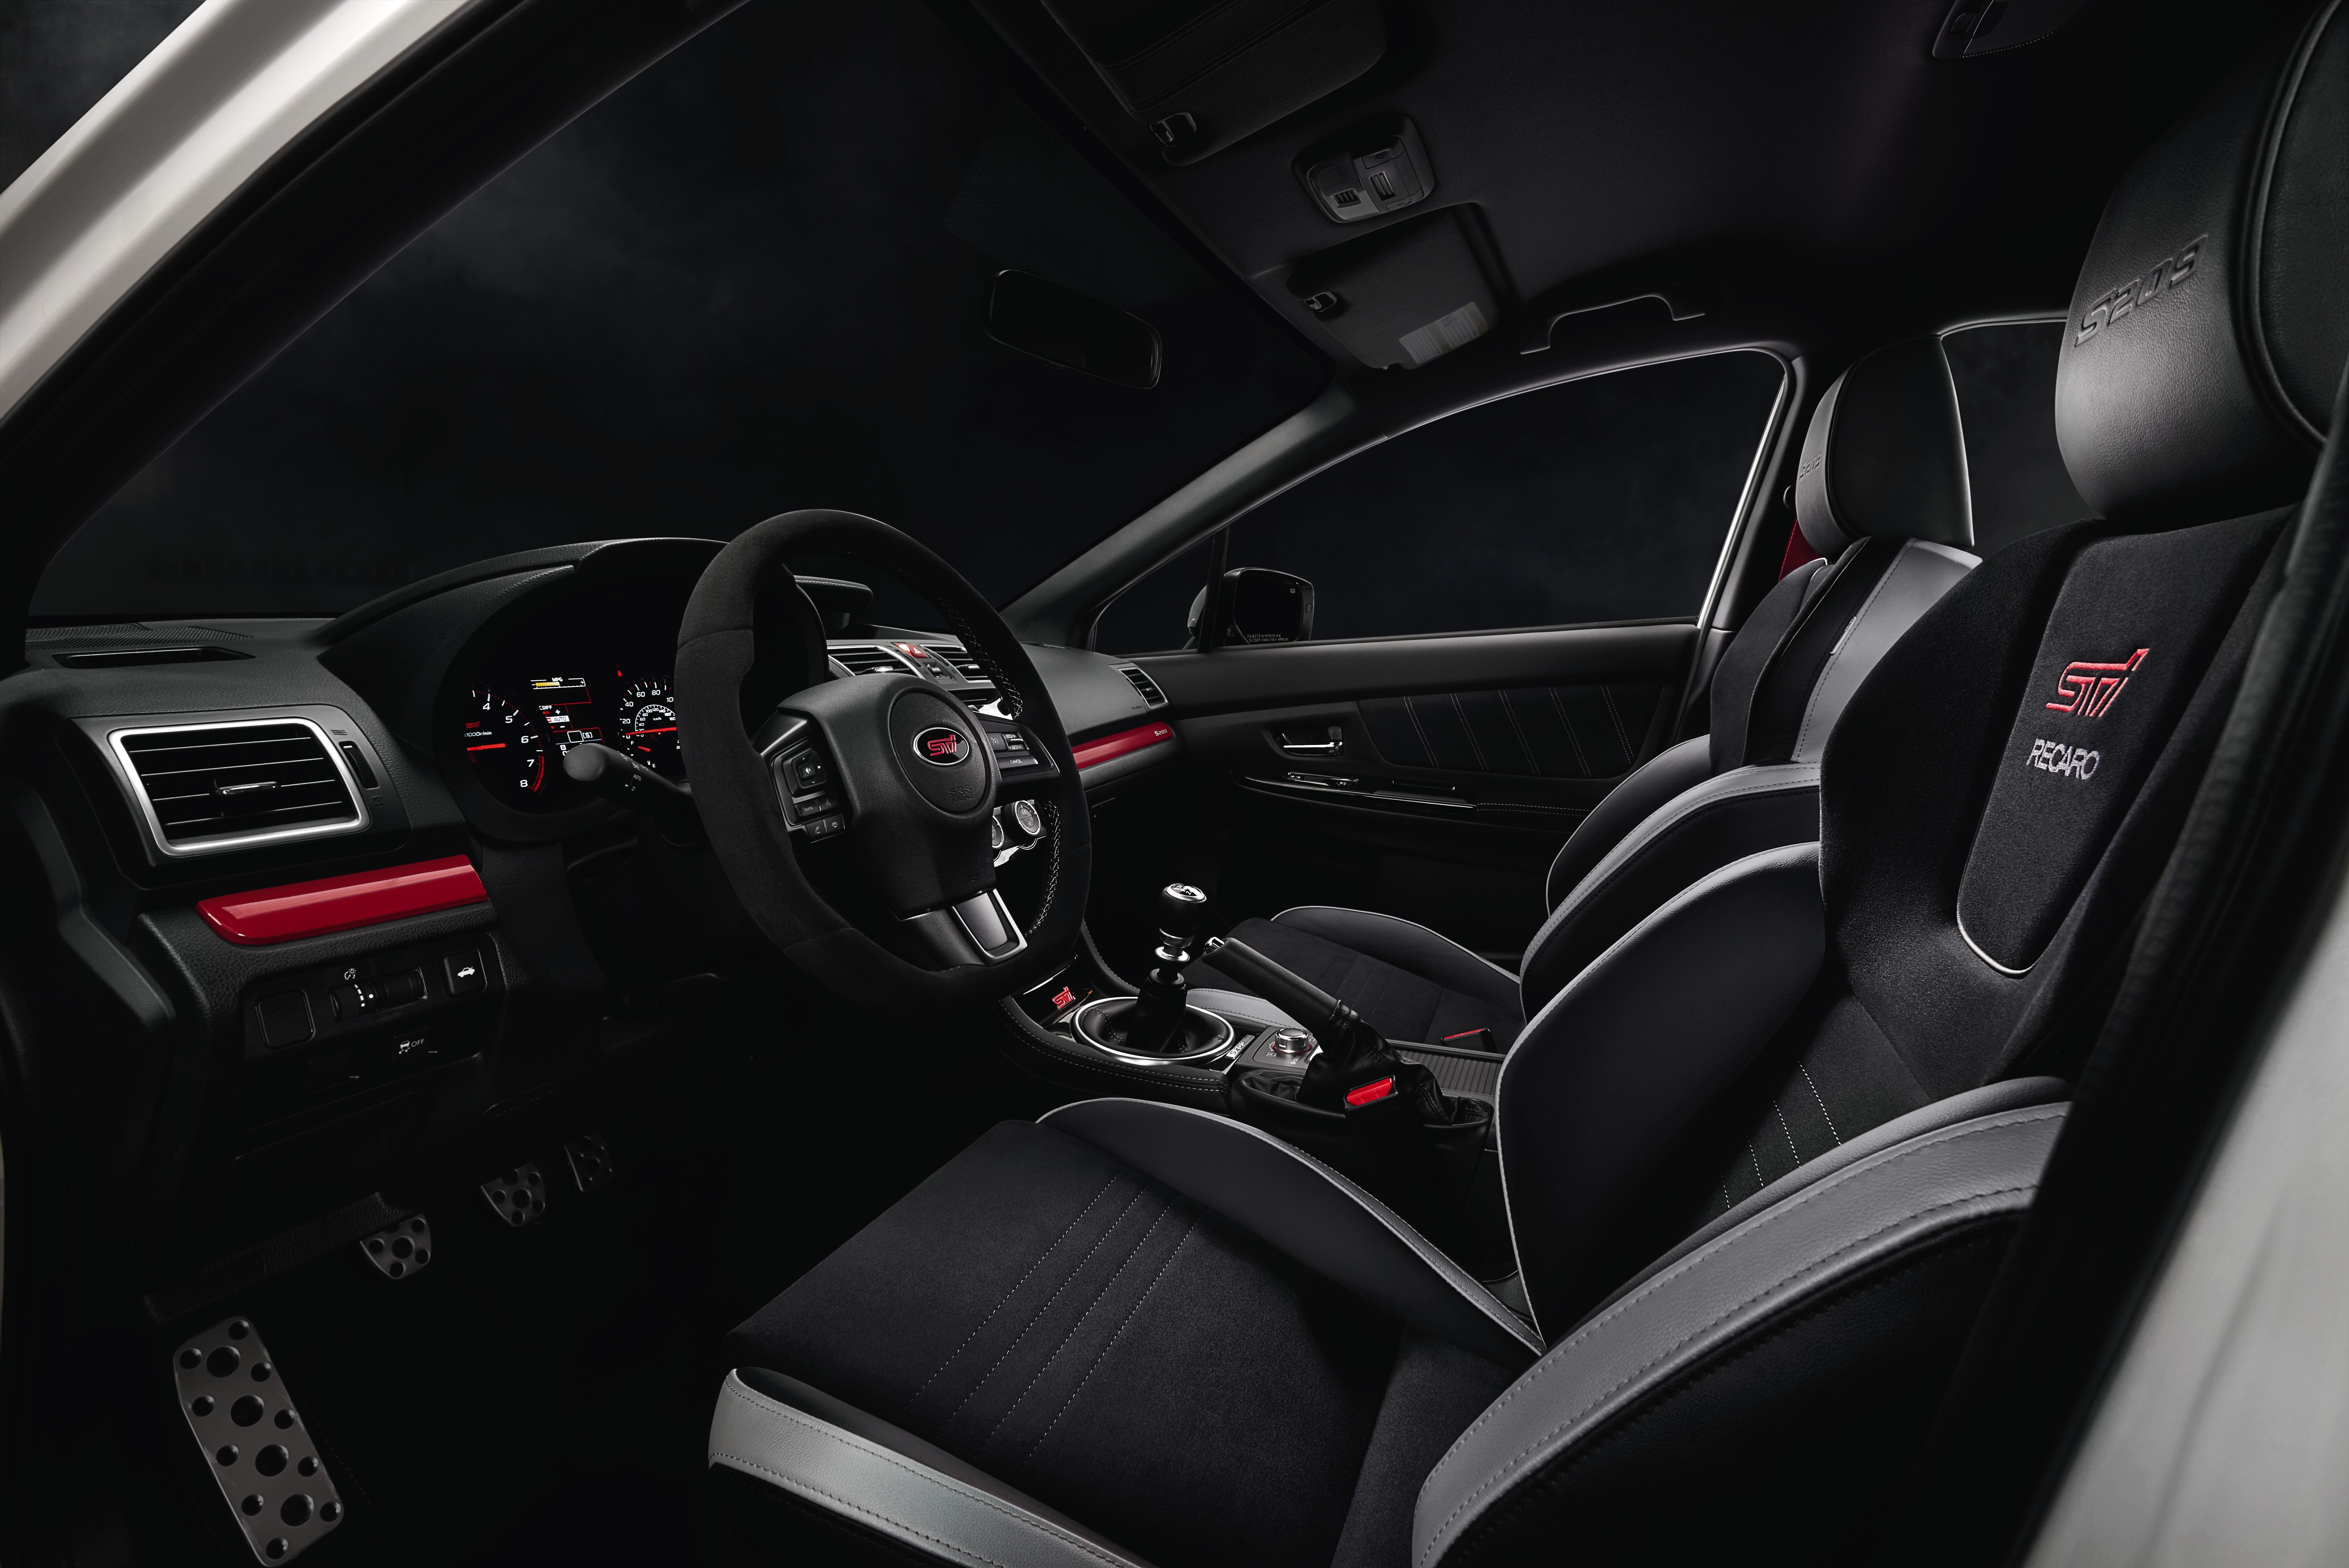 subaru sti wrx s209 interior limited edition tecnica hp international units ready upgrades powerful ever race unleashes debuts speed horsepower